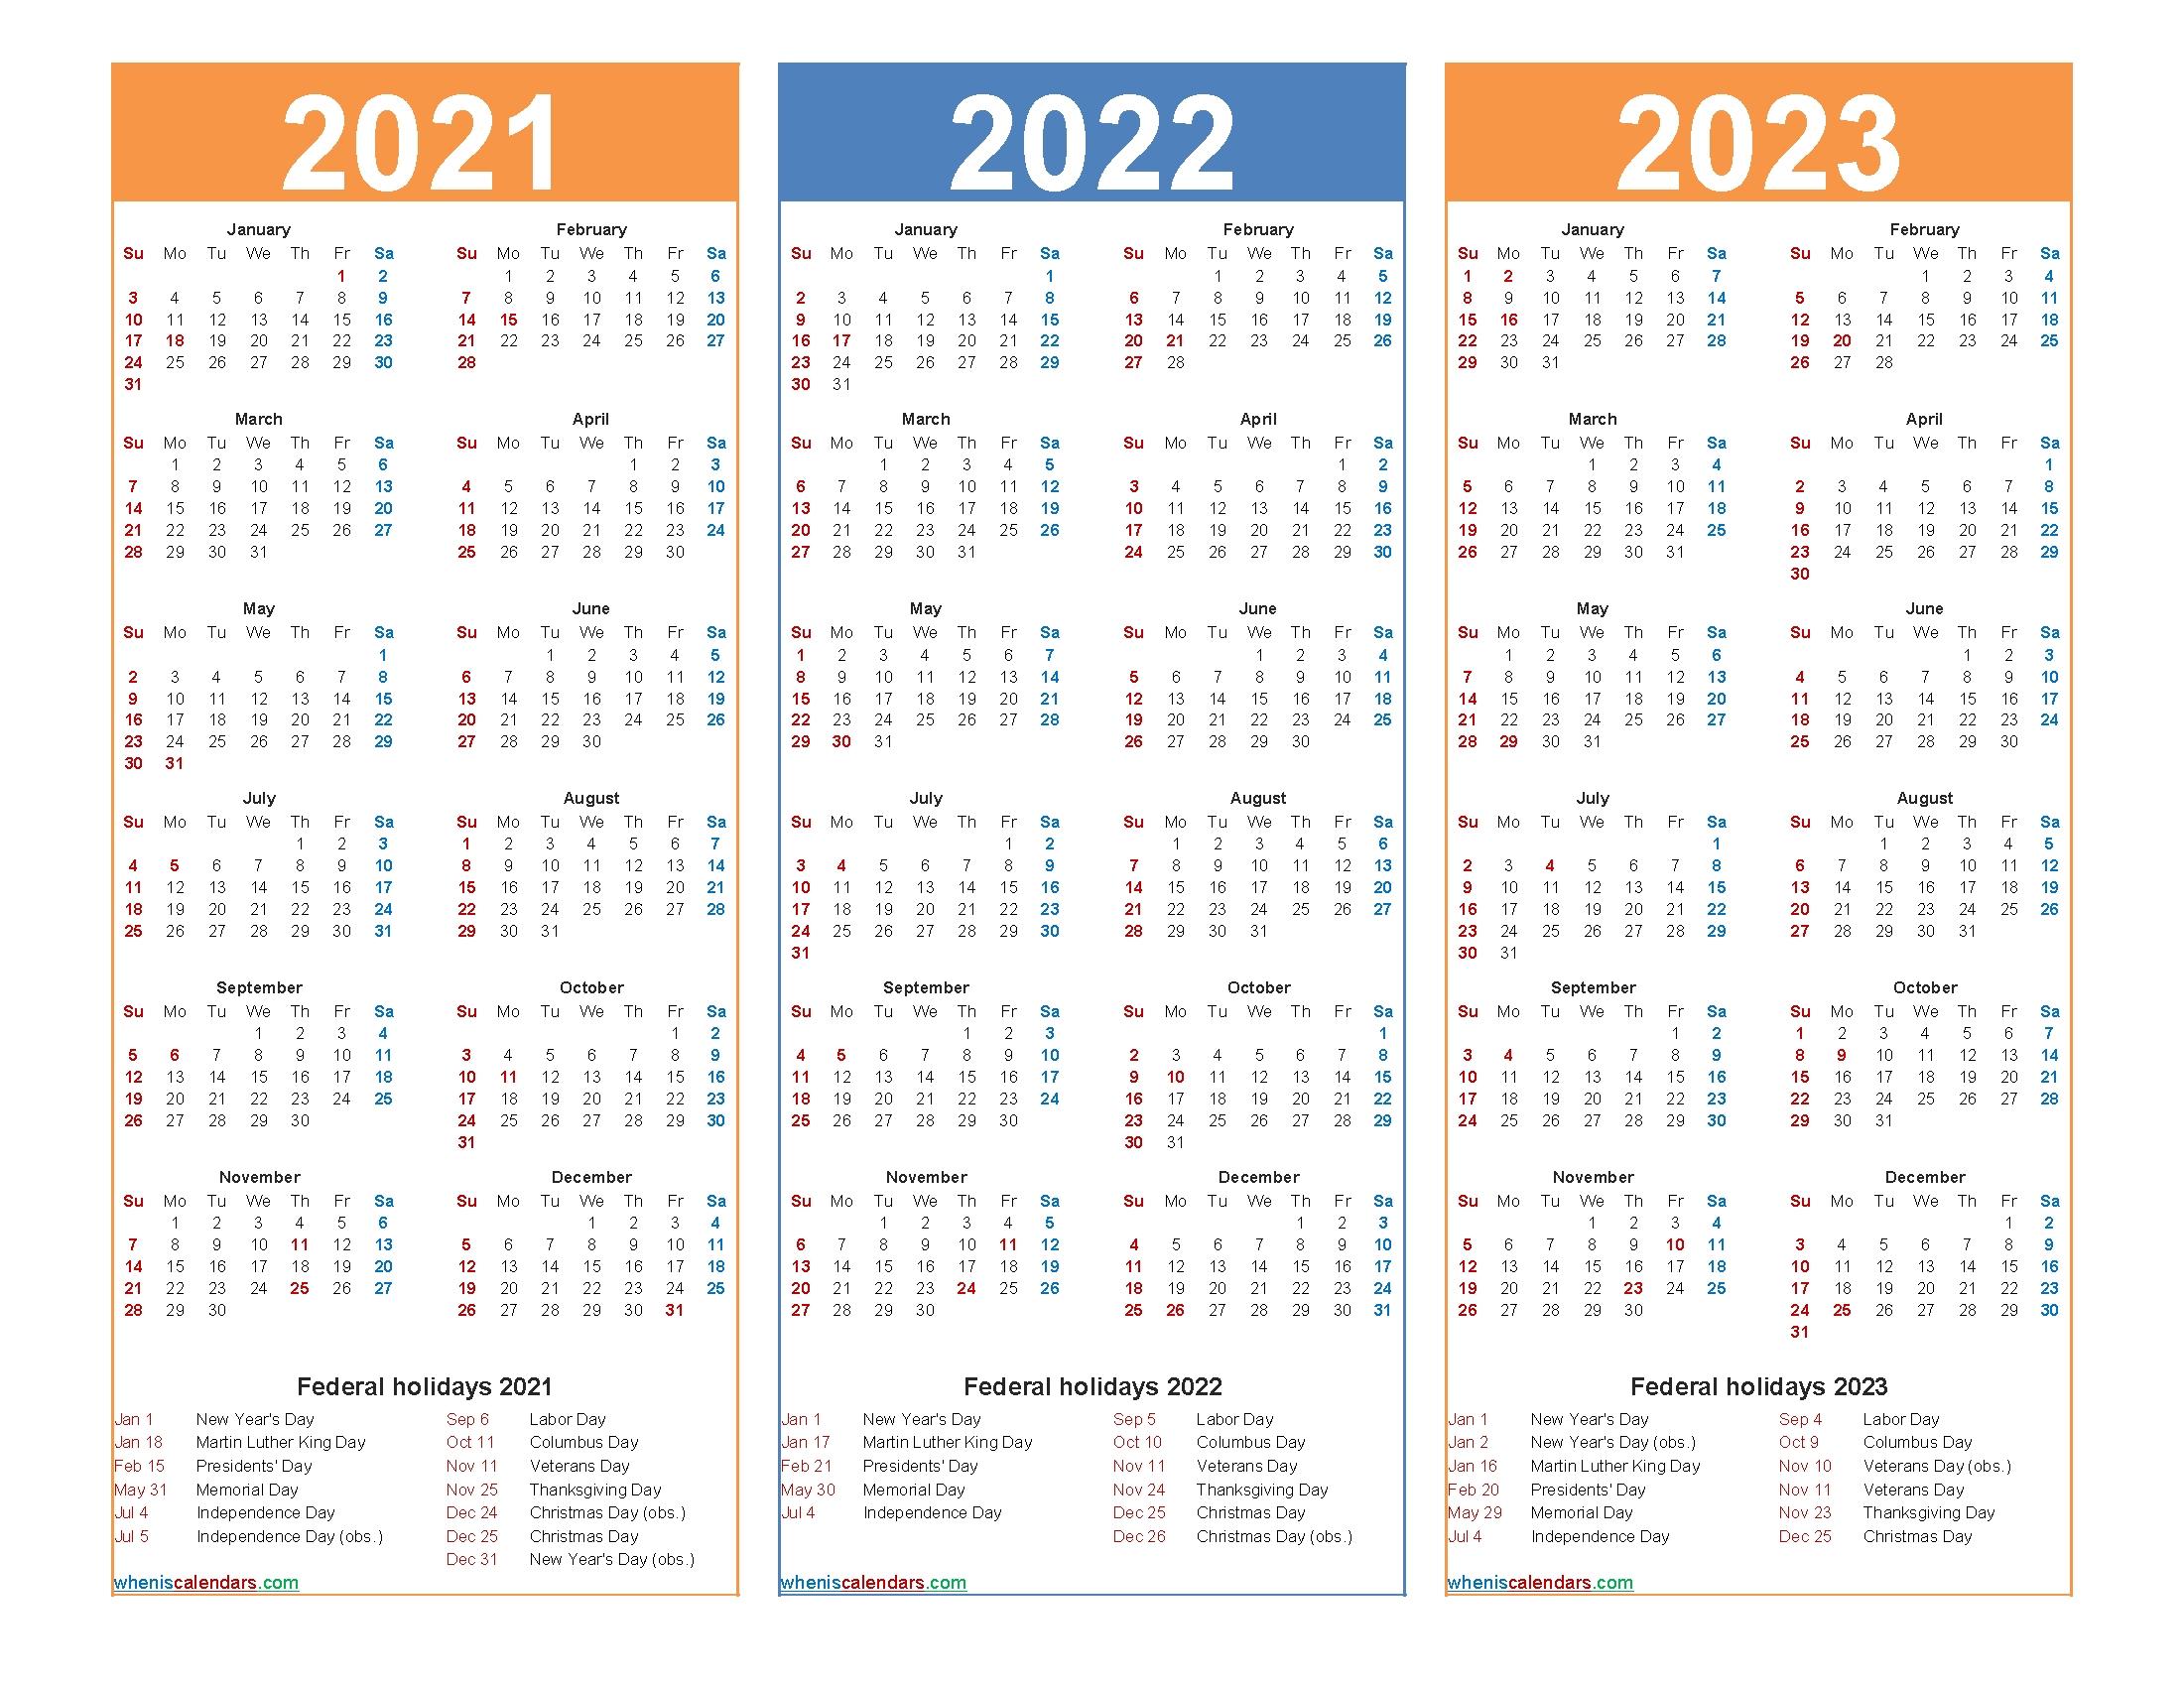 3 Year Calendars 2021 2022 2023 Free Printable